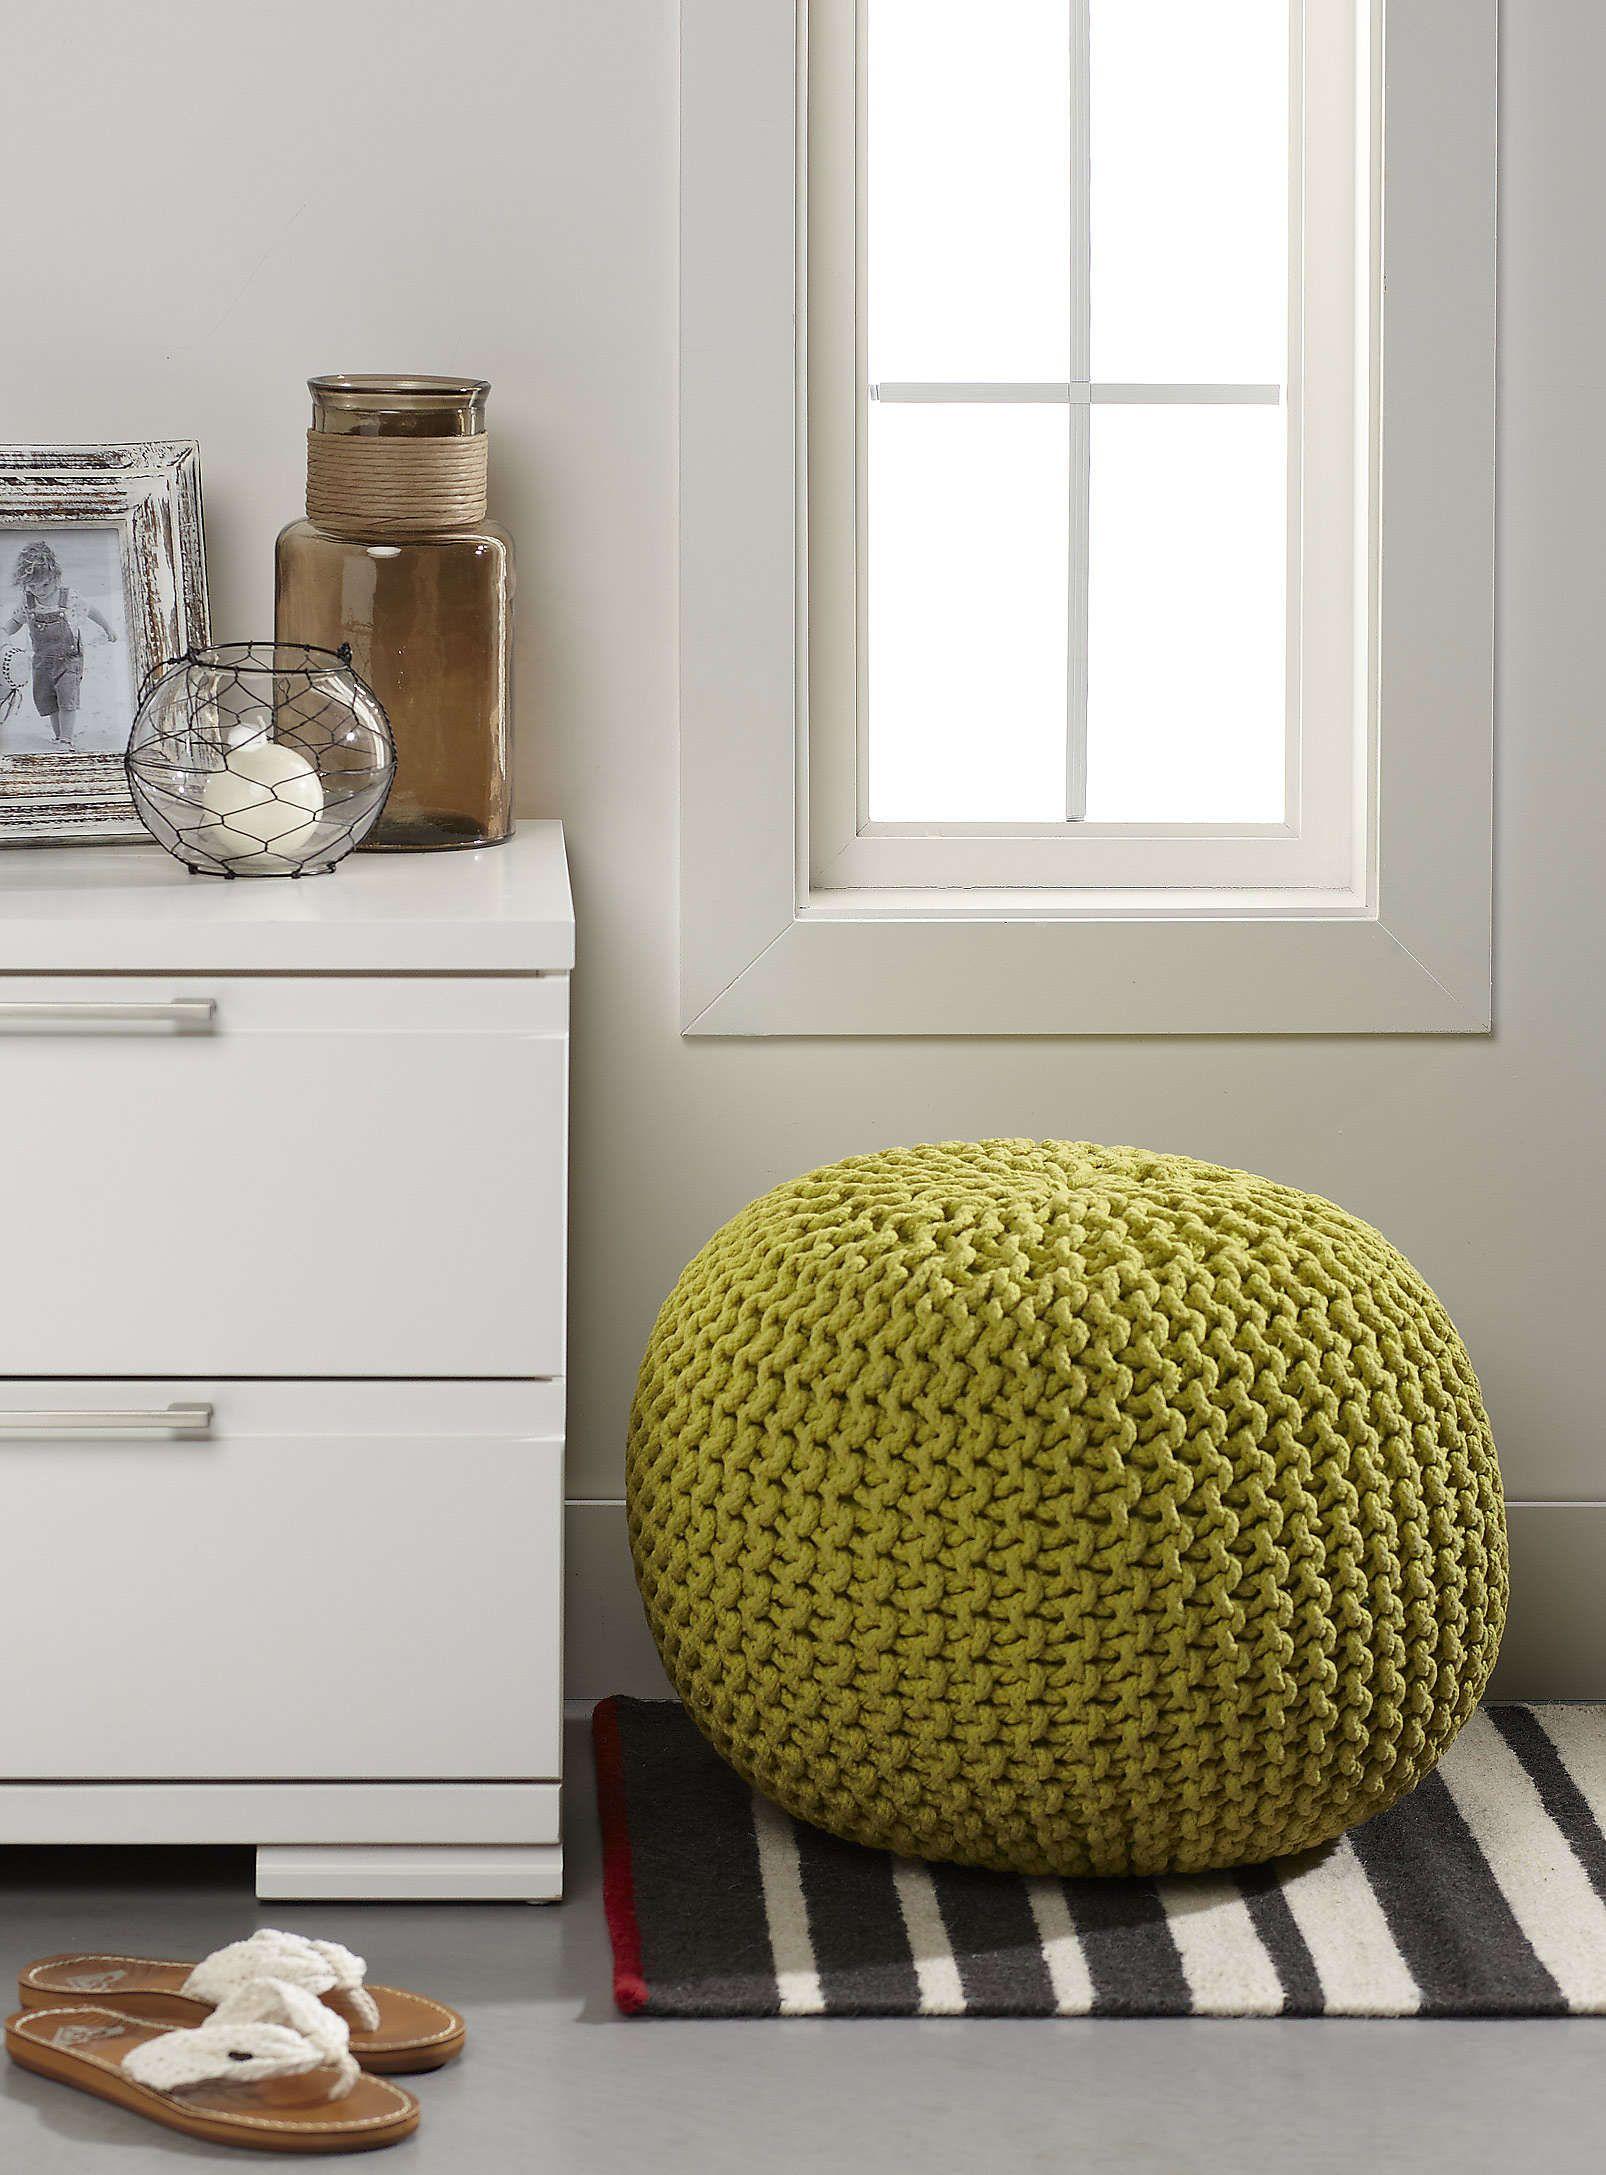 Simons Home Decor Accessories Fashions Http Akadesign Ca